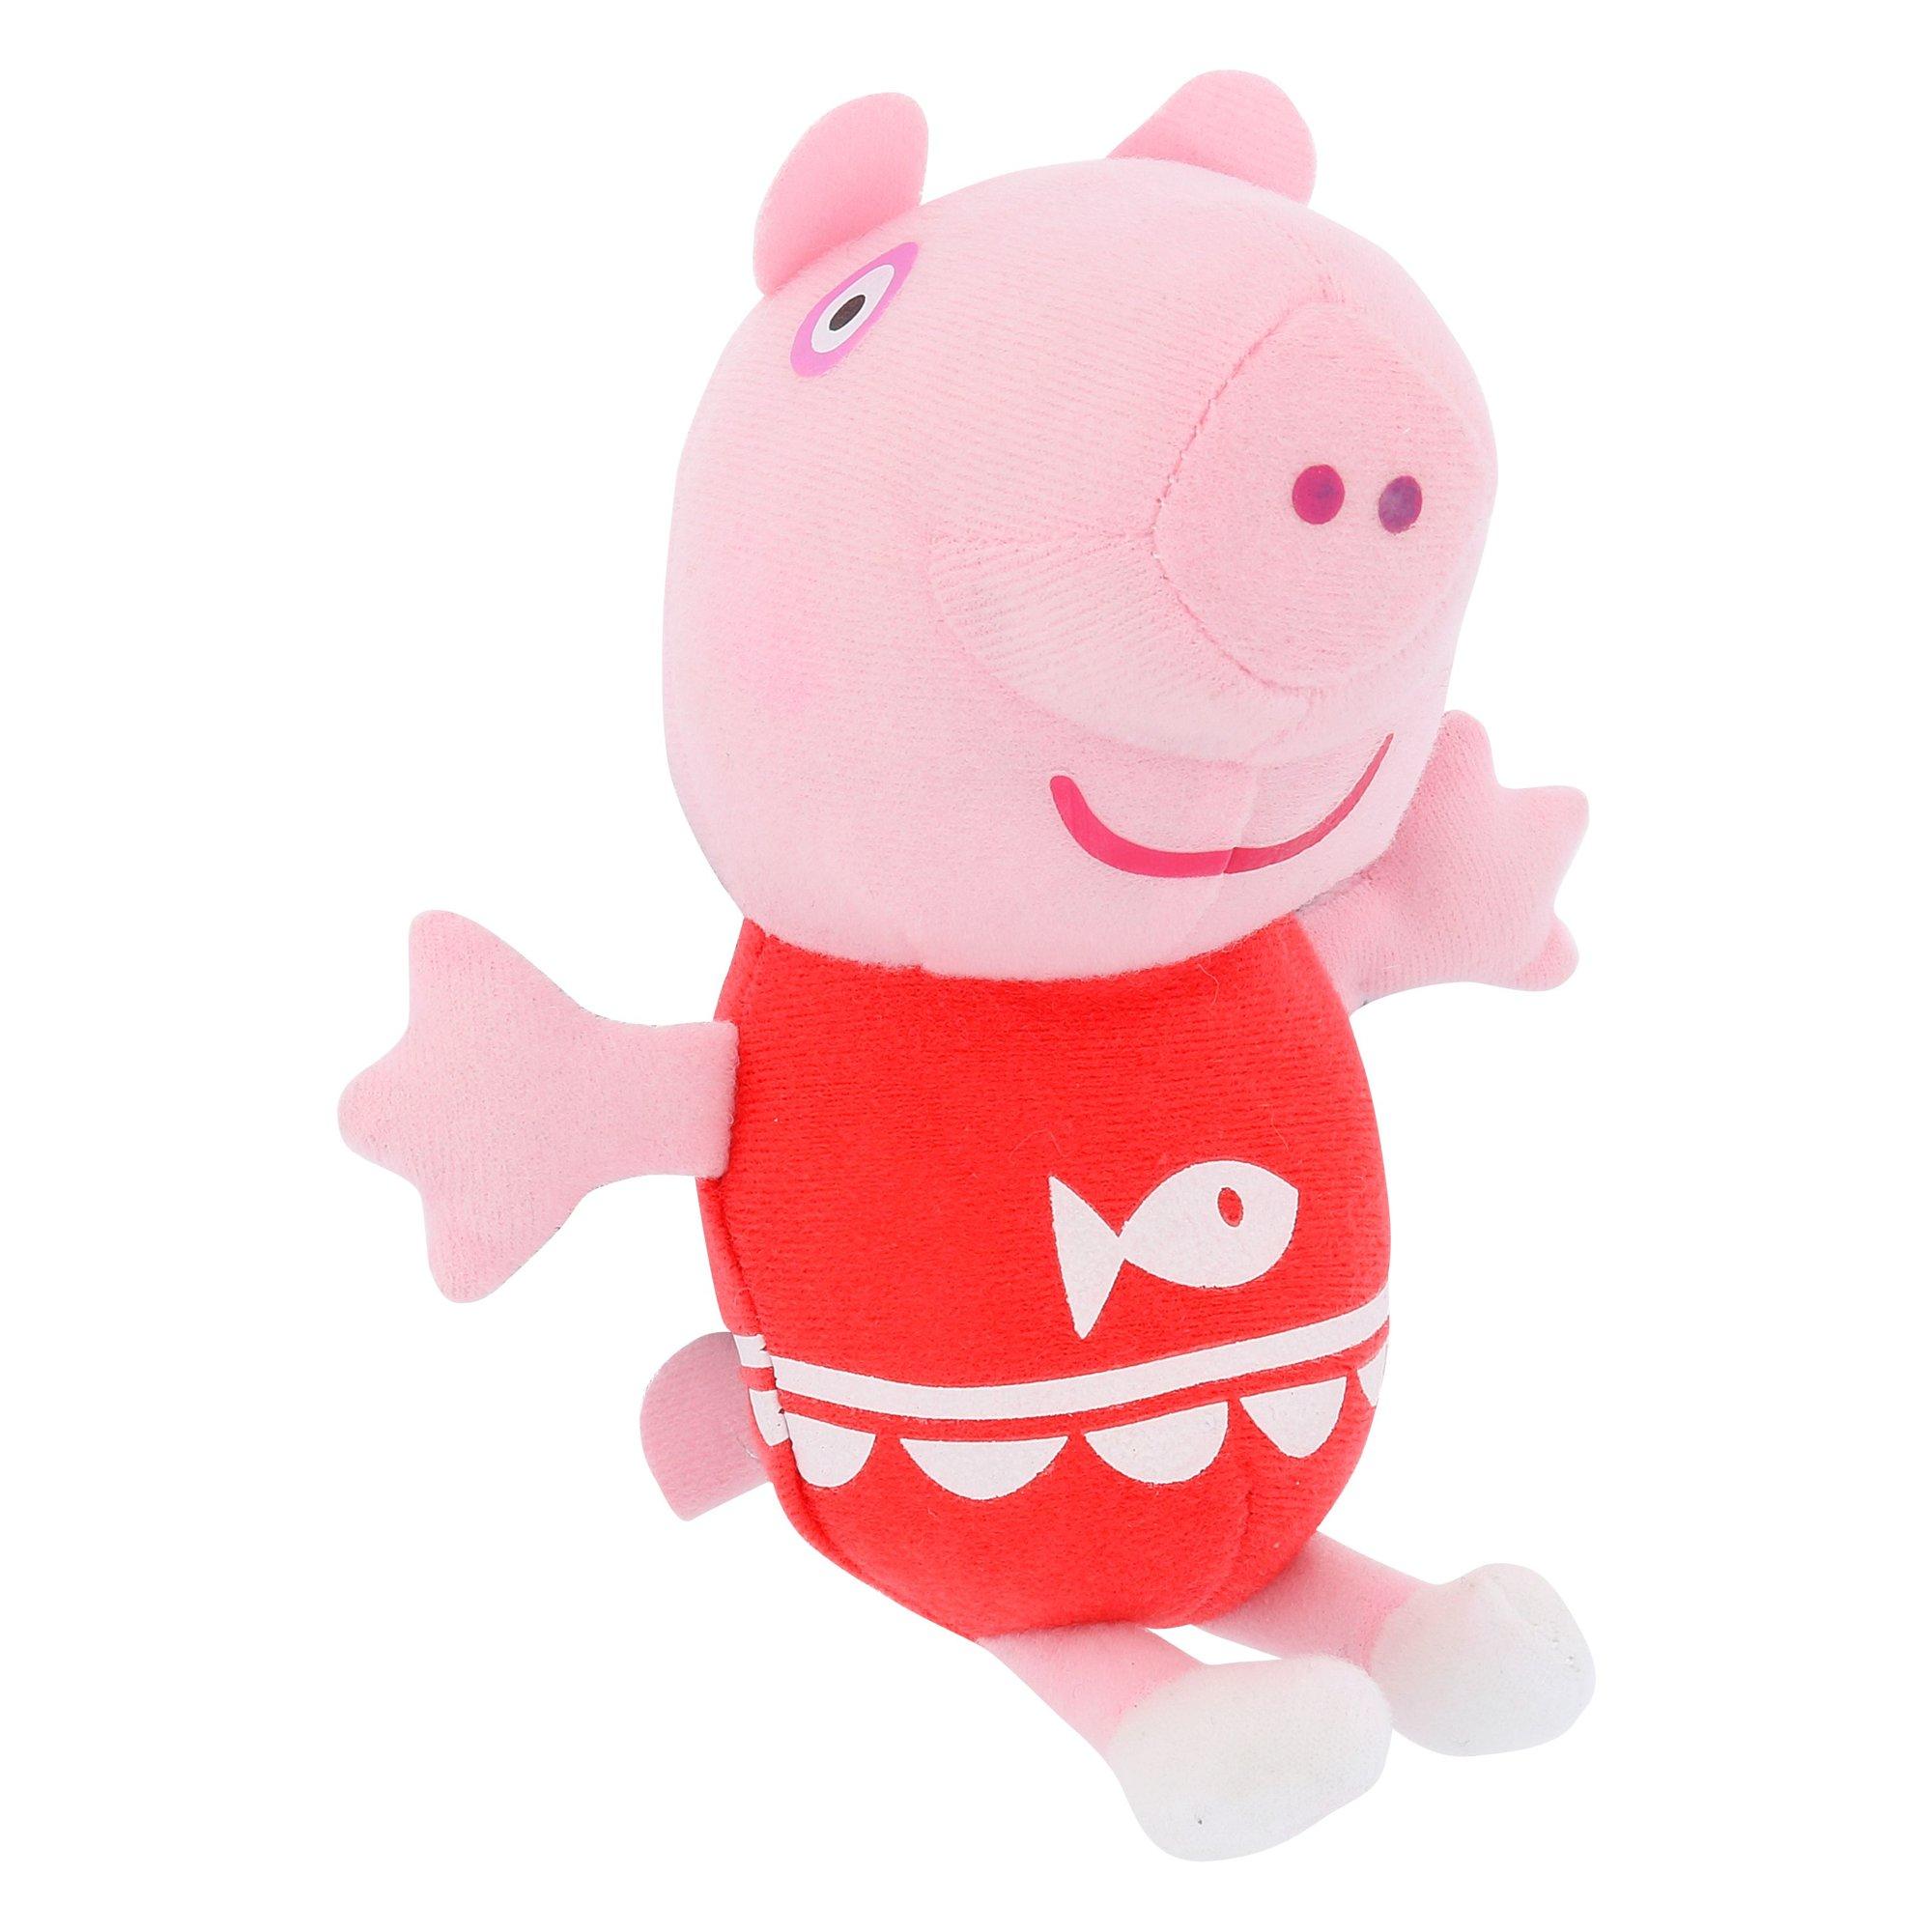 Peppa Pig 3D Bath Sponge Peppa Cosmetic 1ks